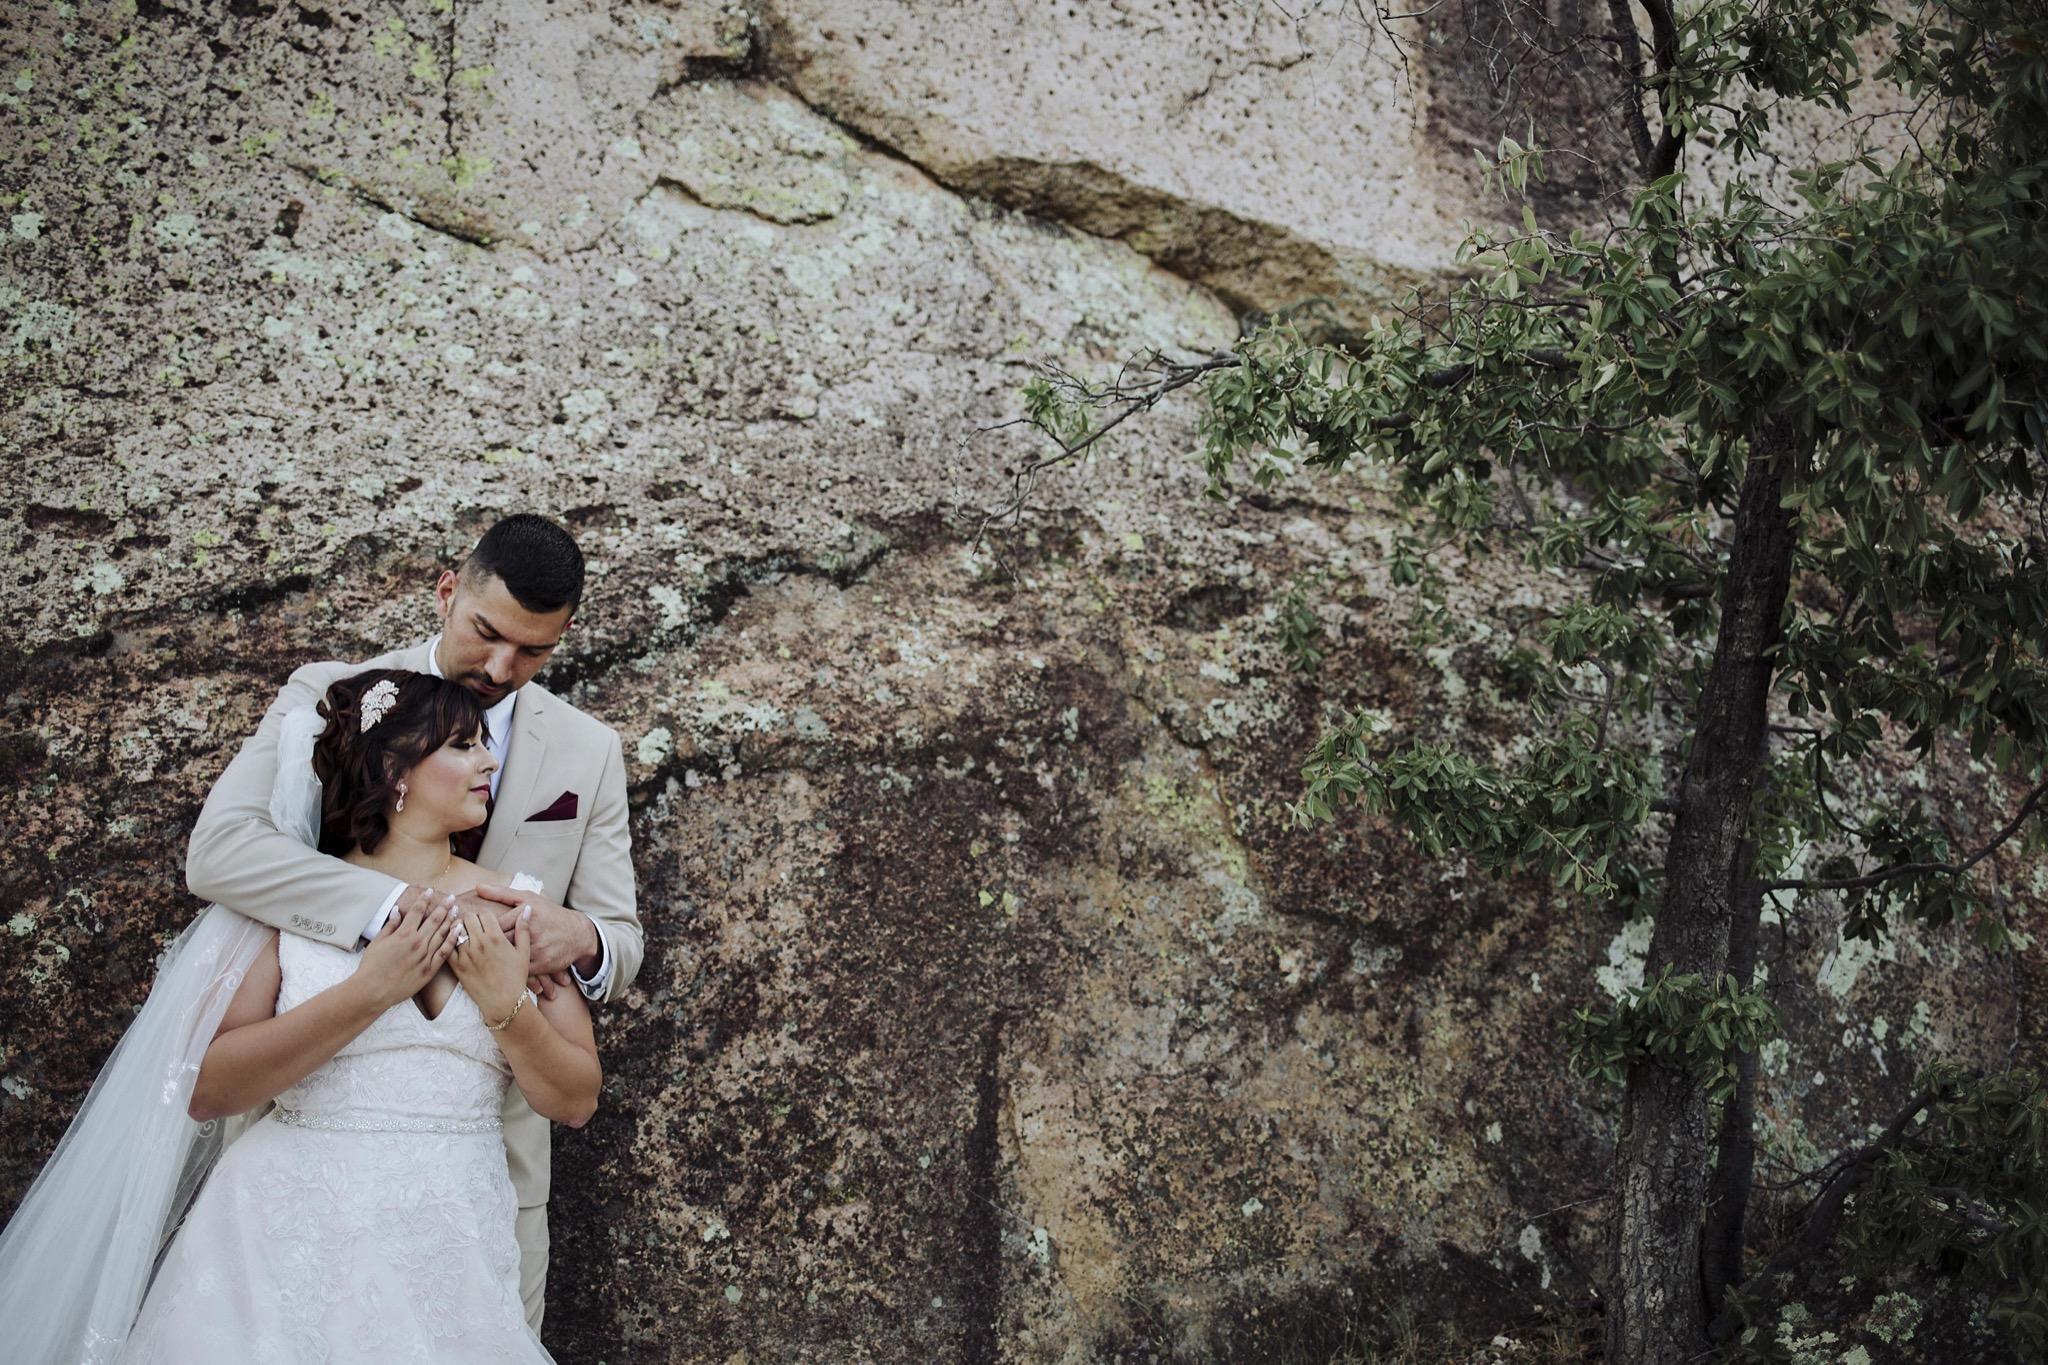 javier_noriega_fotografo_profesional_bodas_zacatecas_mexico_chihuahua_photographer_9